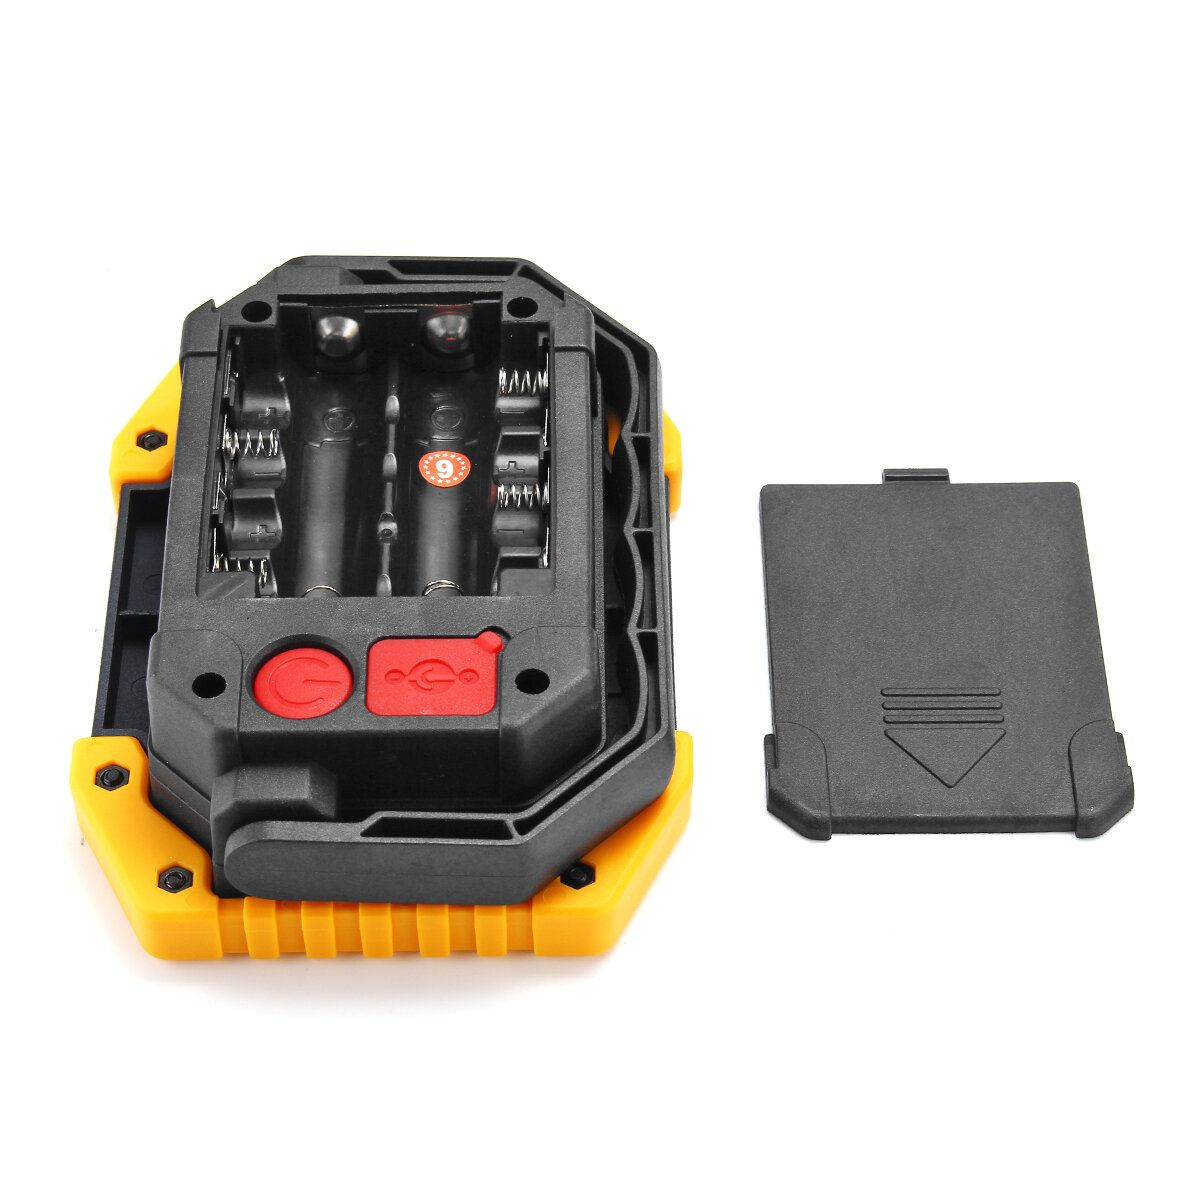 ZND US$12.34 XANES® 30W 1000LM 2 COB USB Rechargeable Waterproof Powerful Work Light Floodlight